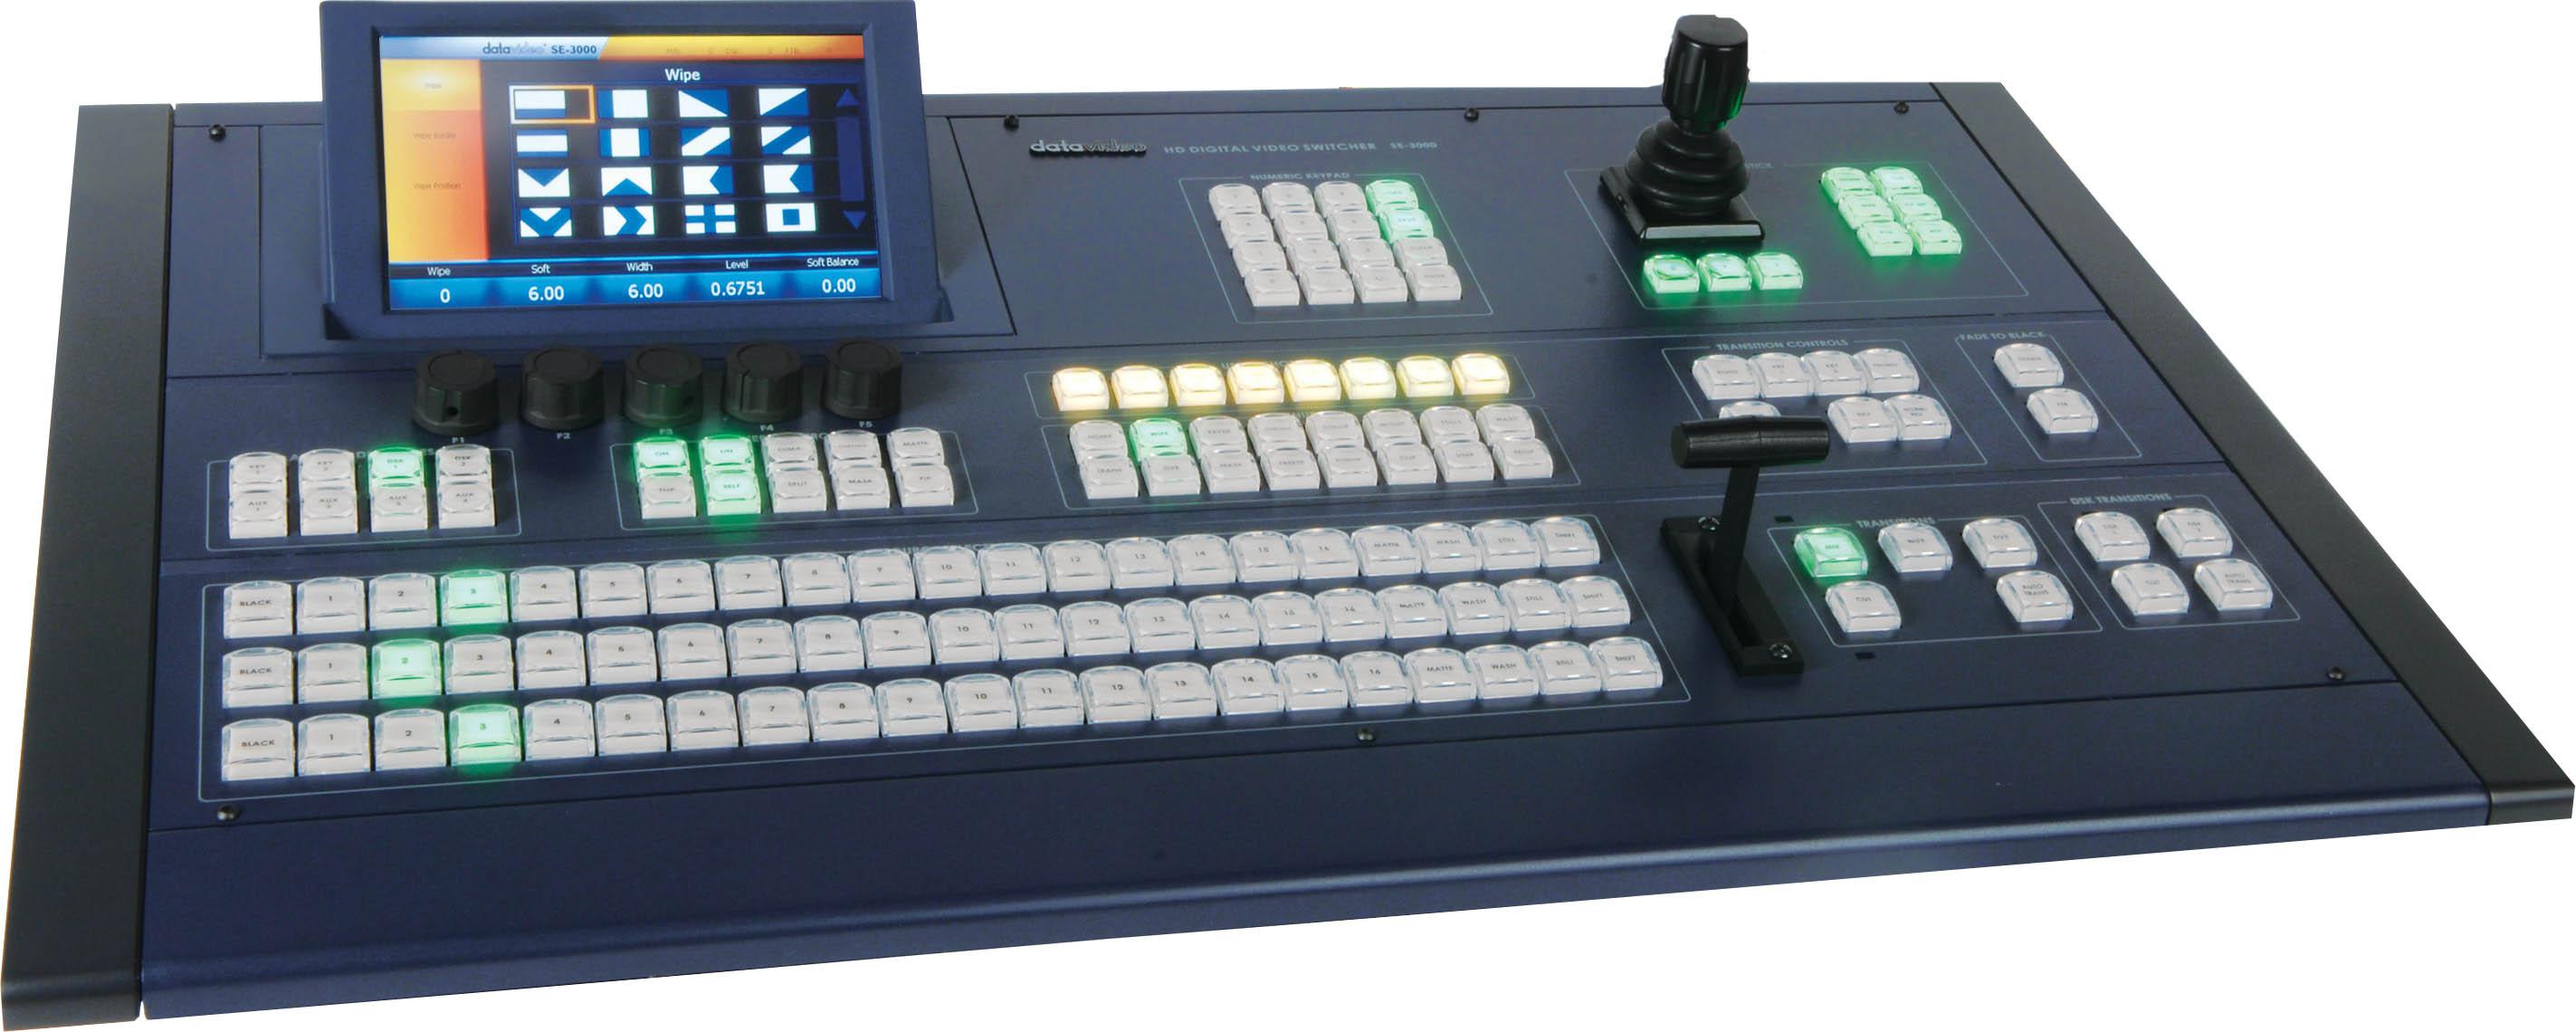 Datavideo SE-30000 Vision Mixer